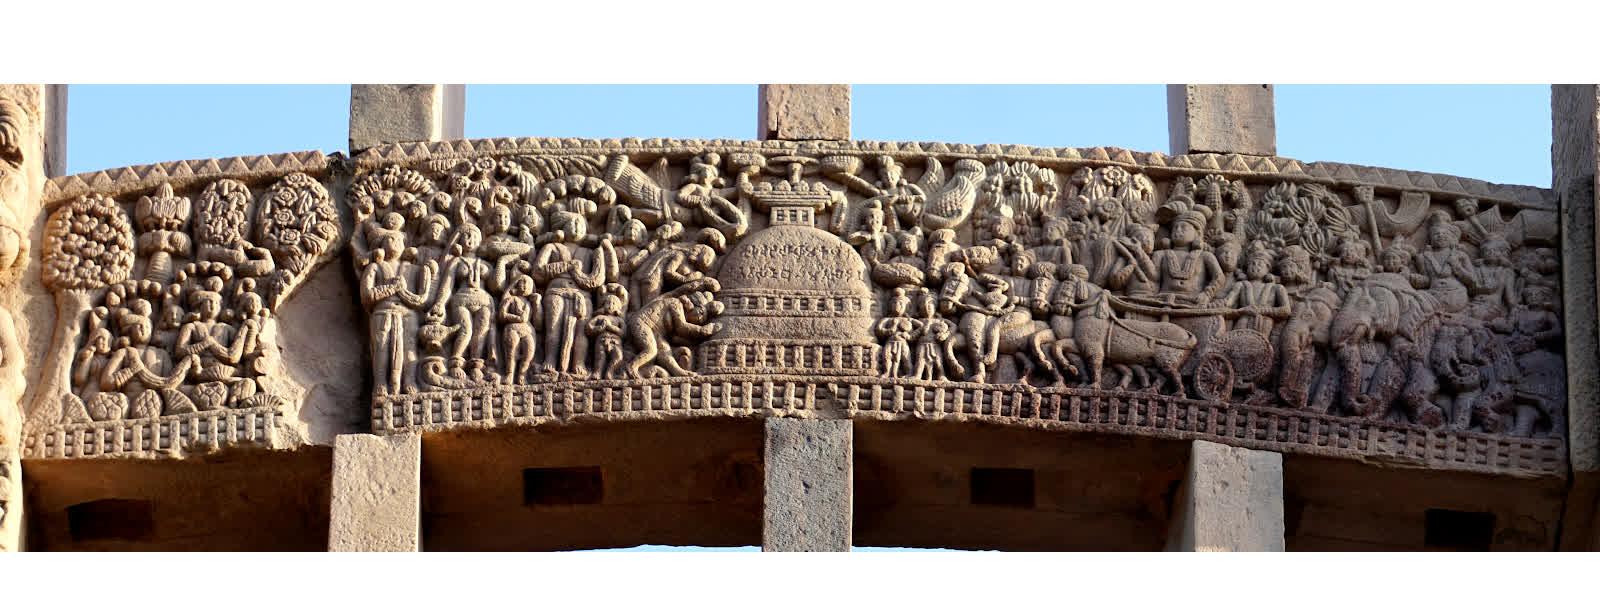 Ramagrama Stupa: The One That Got Away!